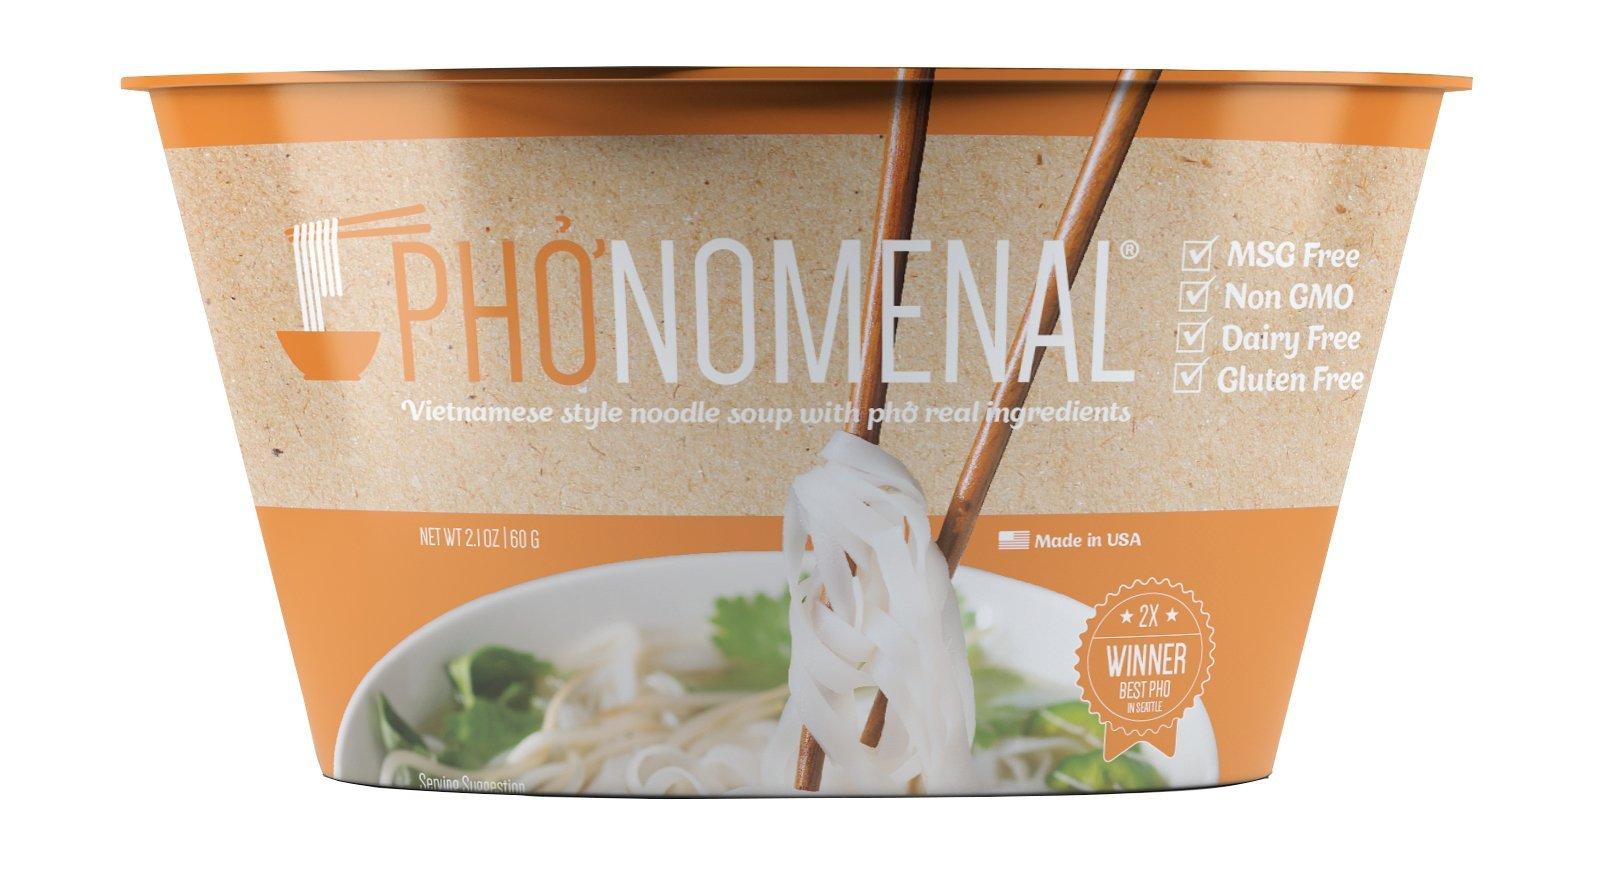 Amazon.com : Pho'nomenal Instant Phở chay, Vietnamese